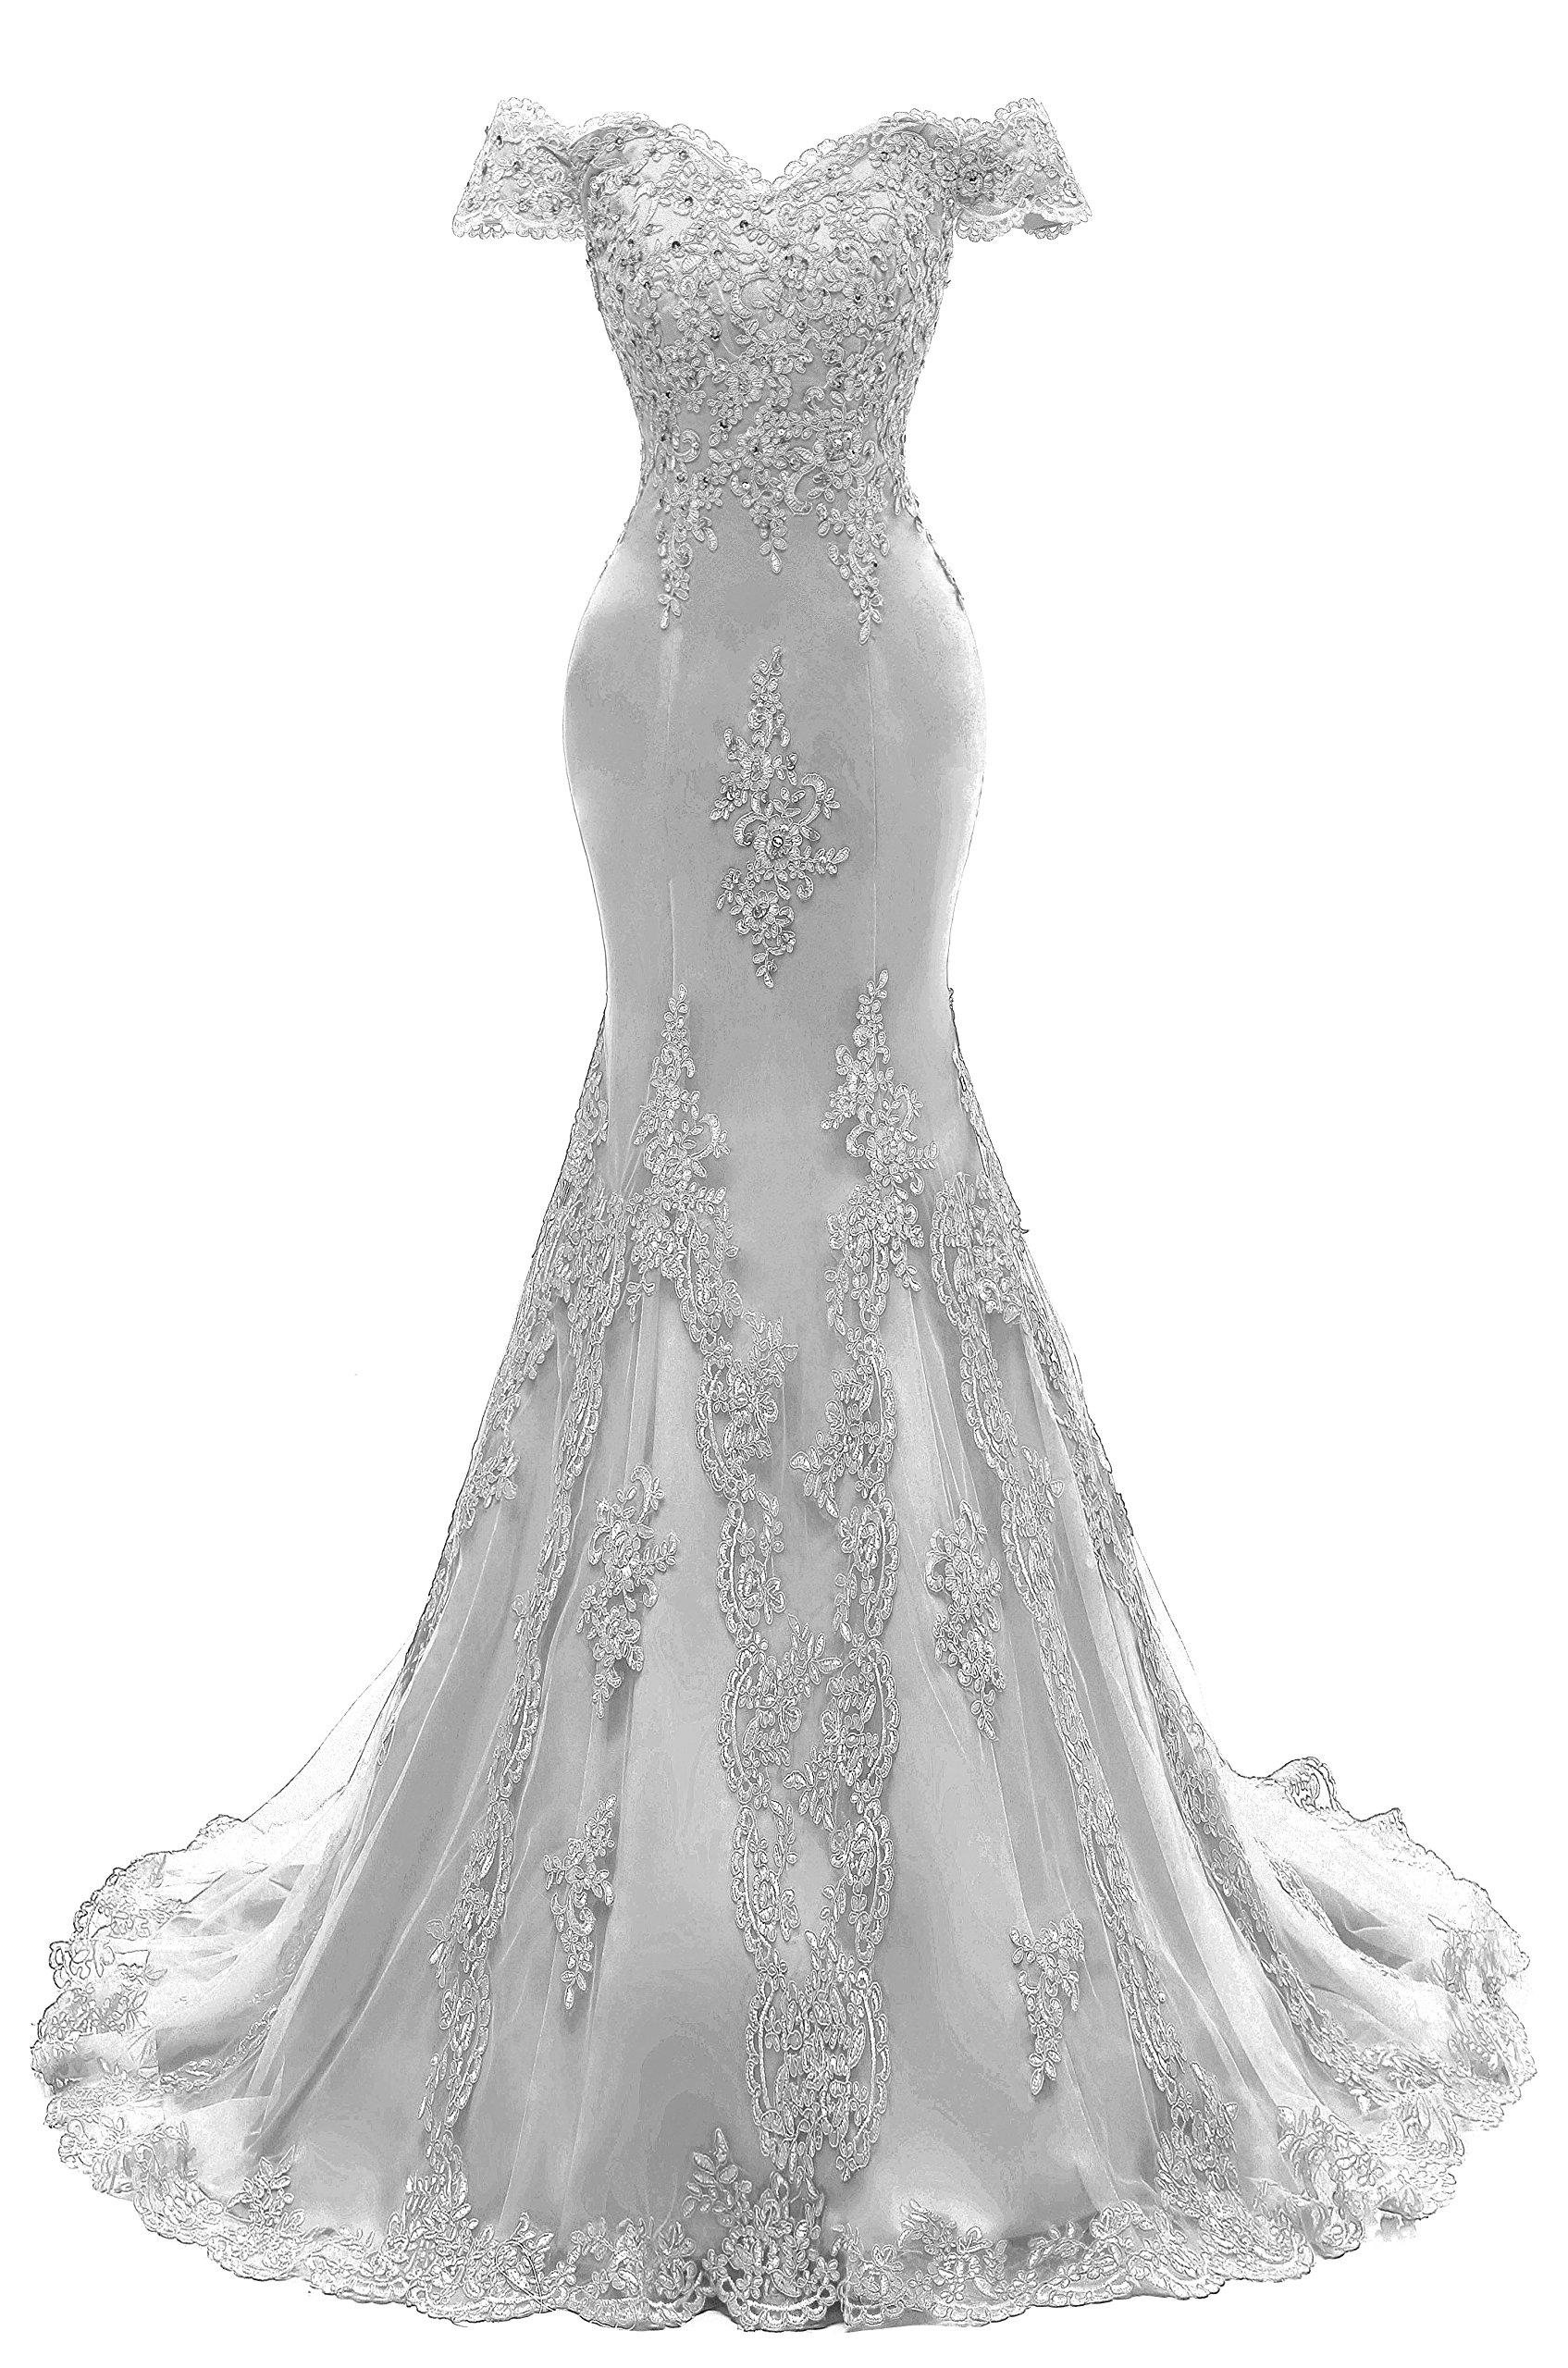 Bbonlinedress Long Chiffon Lace Ruched Cocktail Wedding